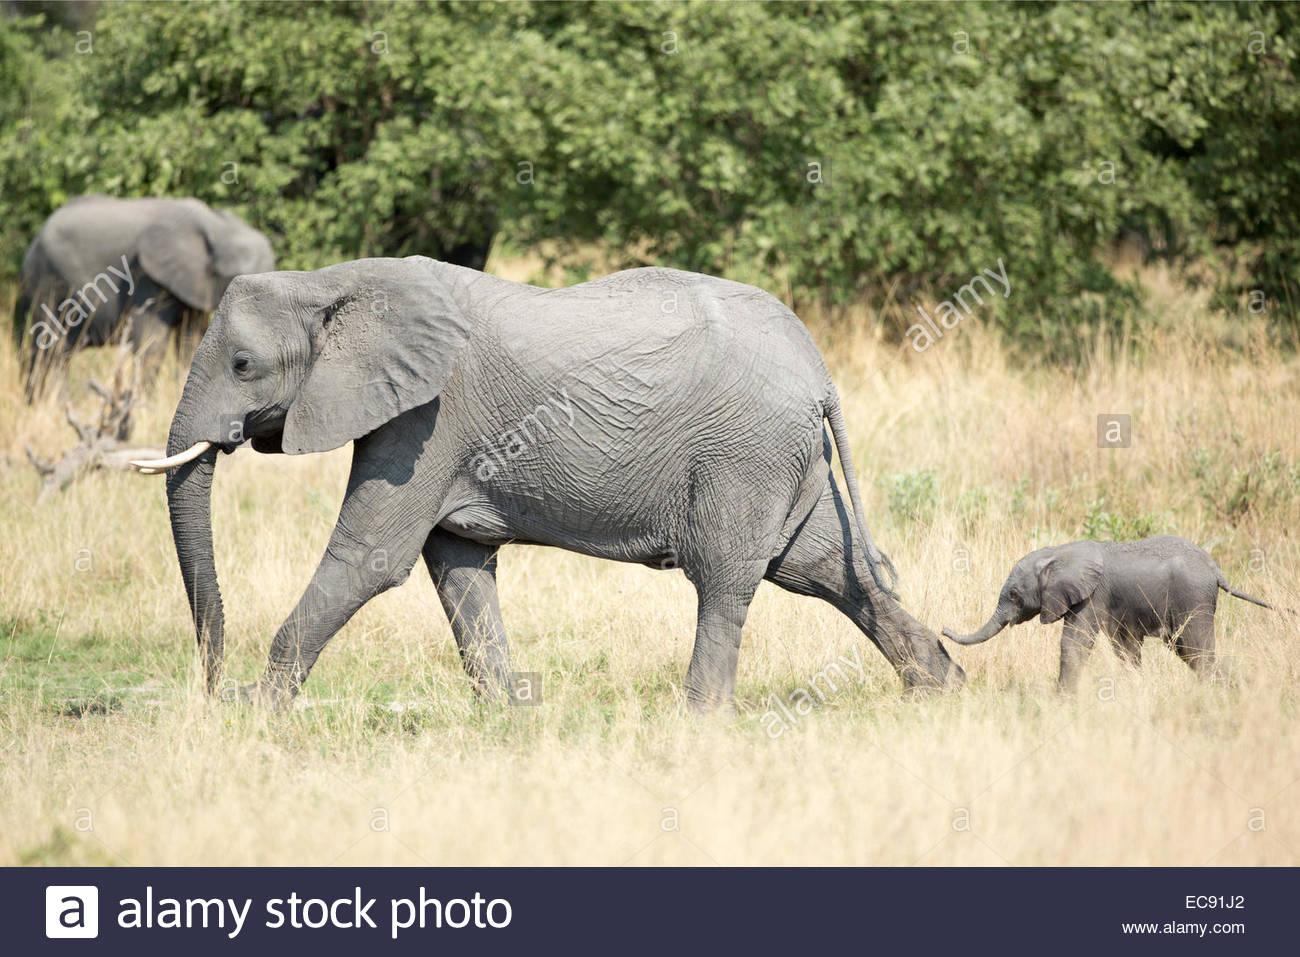 African Elephant, Vumbura Plains, Okavango Delta, Botswana - Stock Image